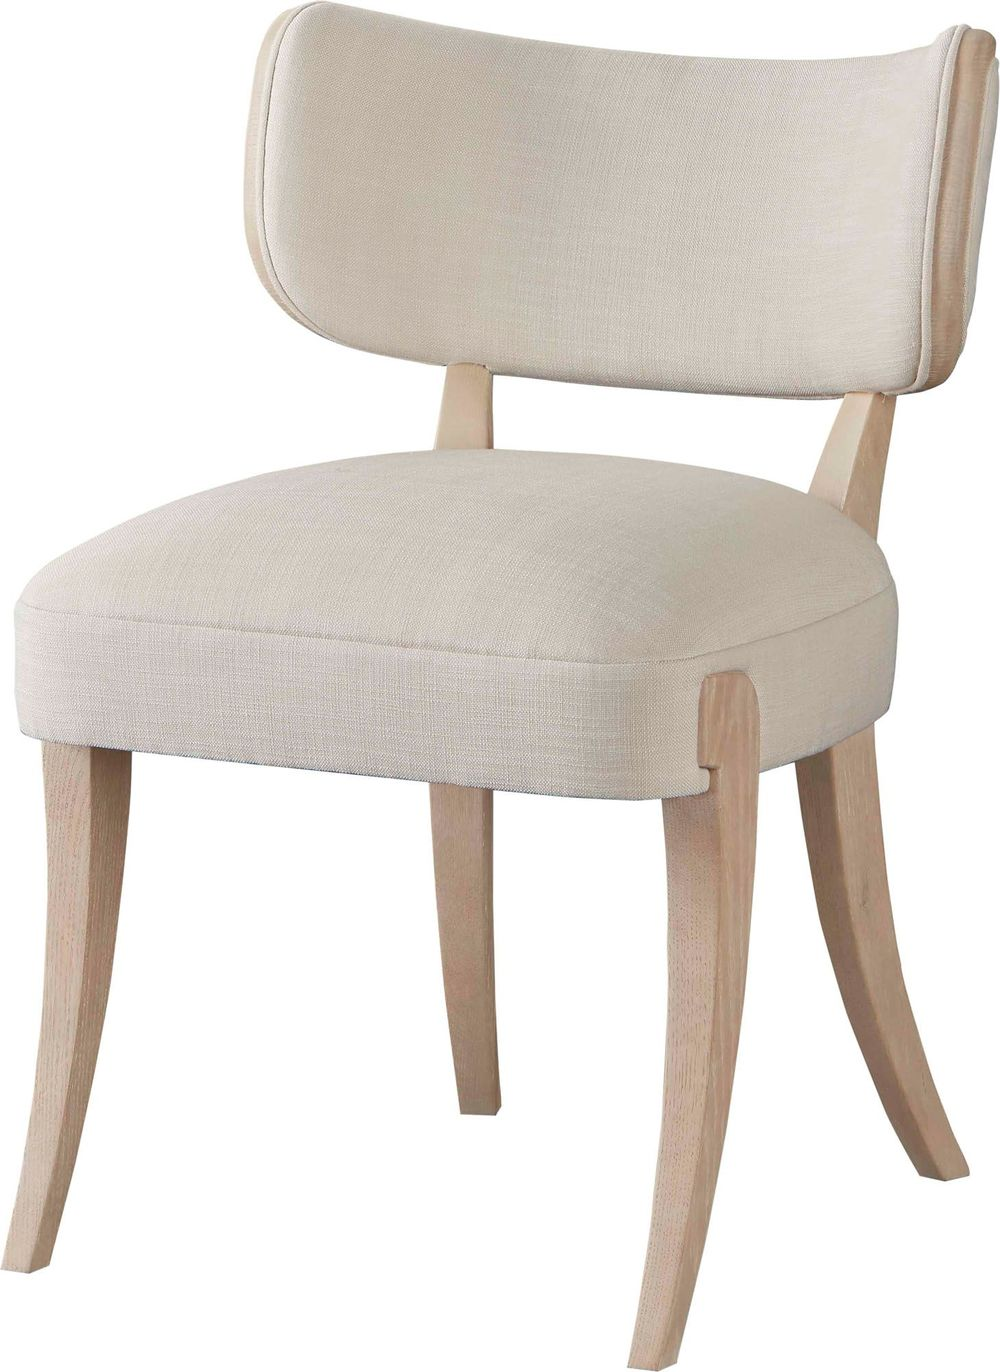 Baker Furniture - Grande Aegean Chair